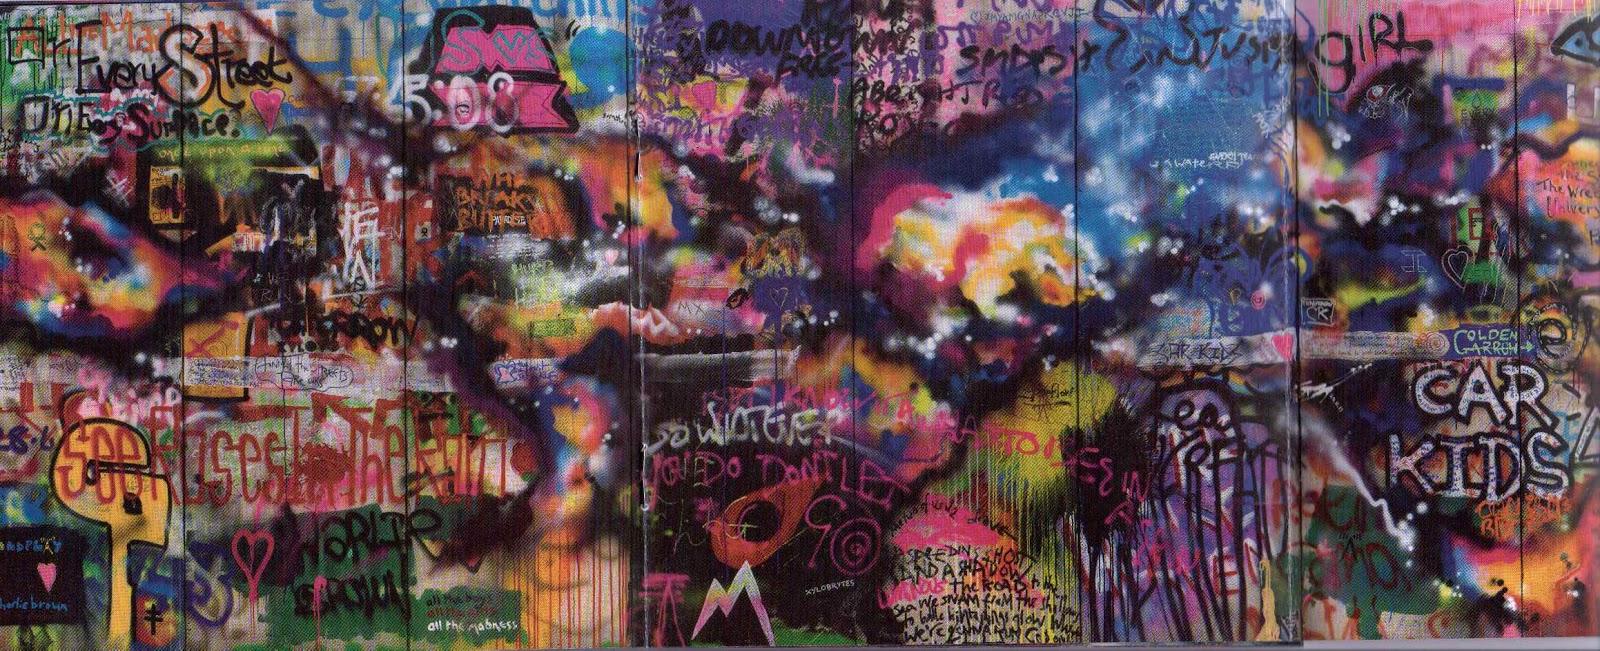 Mark Prince A2 Media: Coldplay- Mylo Xyloto Digipak Analysis